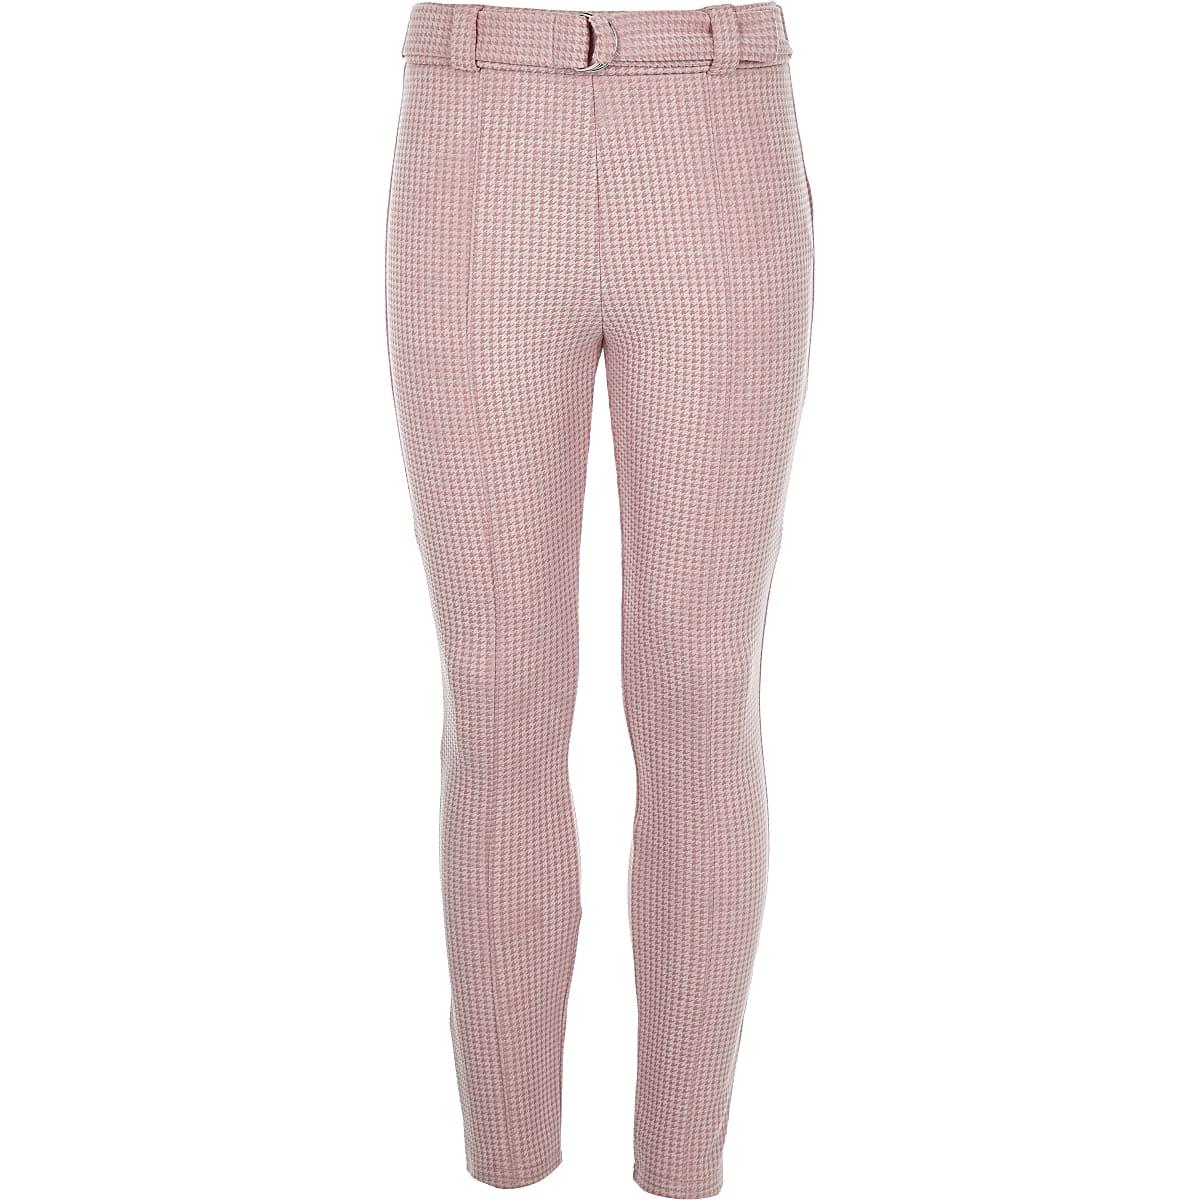 Girls pink houndstooth check leggings